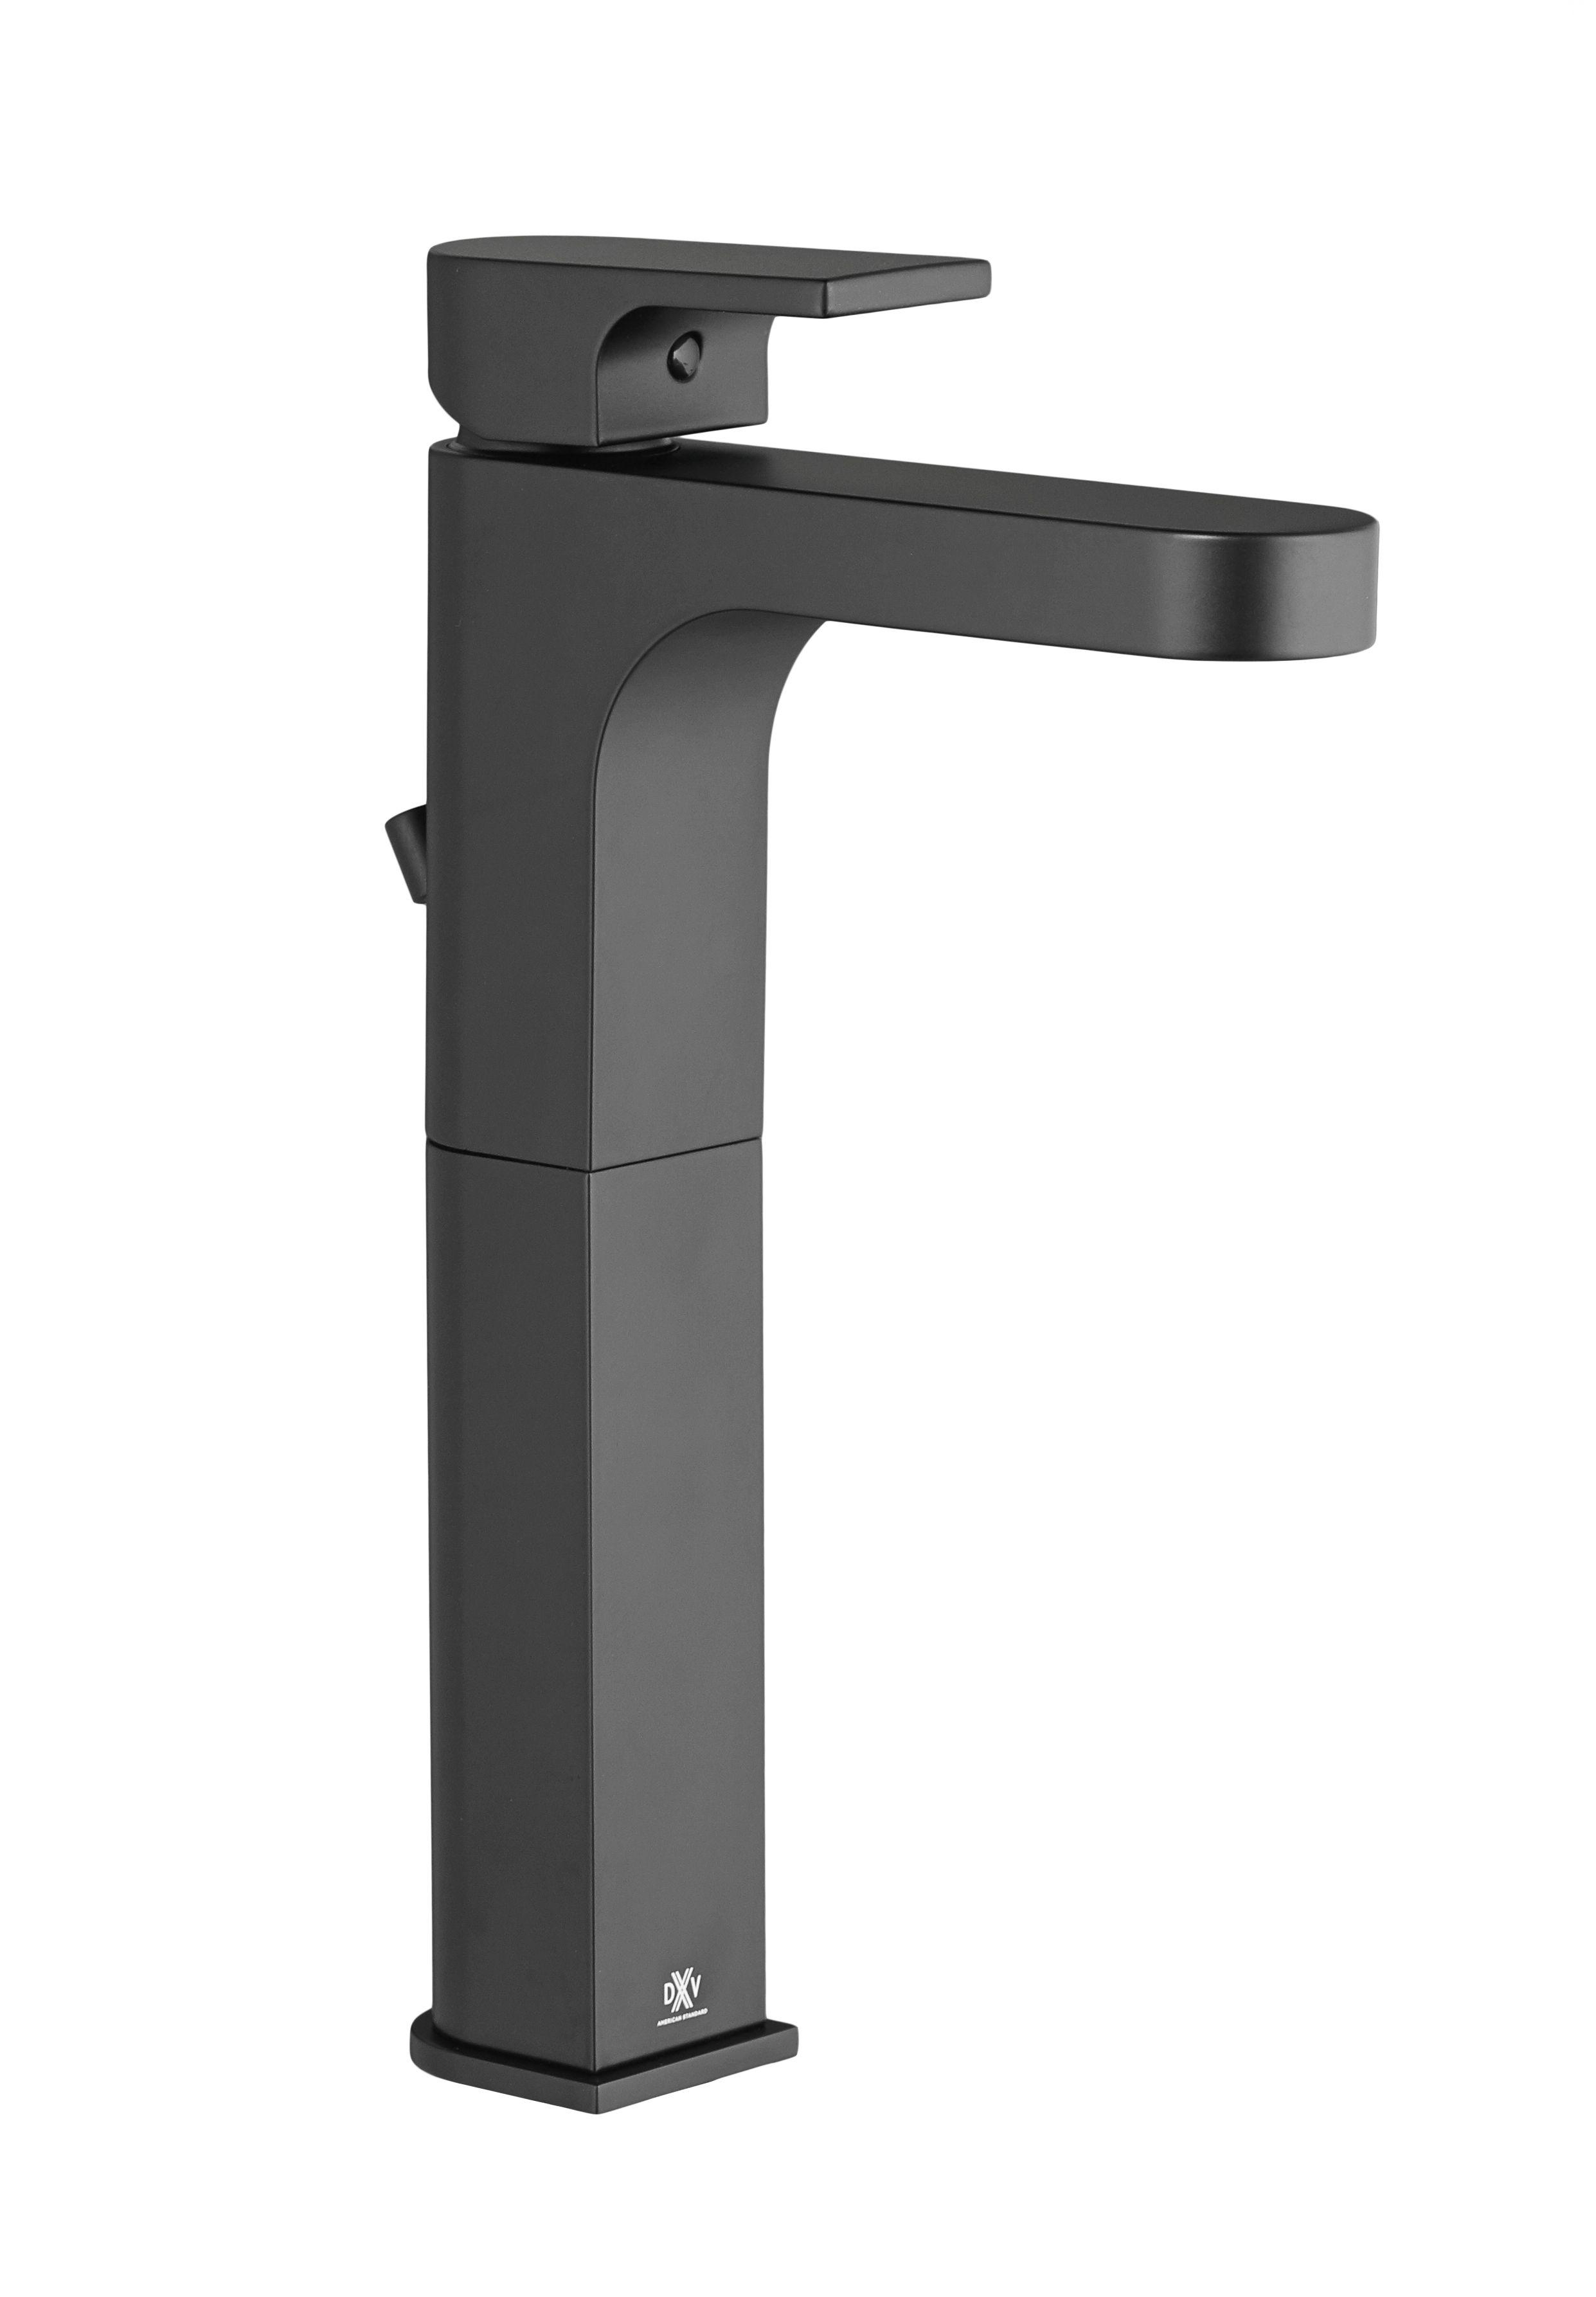 Pedestal Sink Cossu 20 Inch Round Pedestal Lavatory By Dxv Vessel Faucets Electronic Bidet Dxv